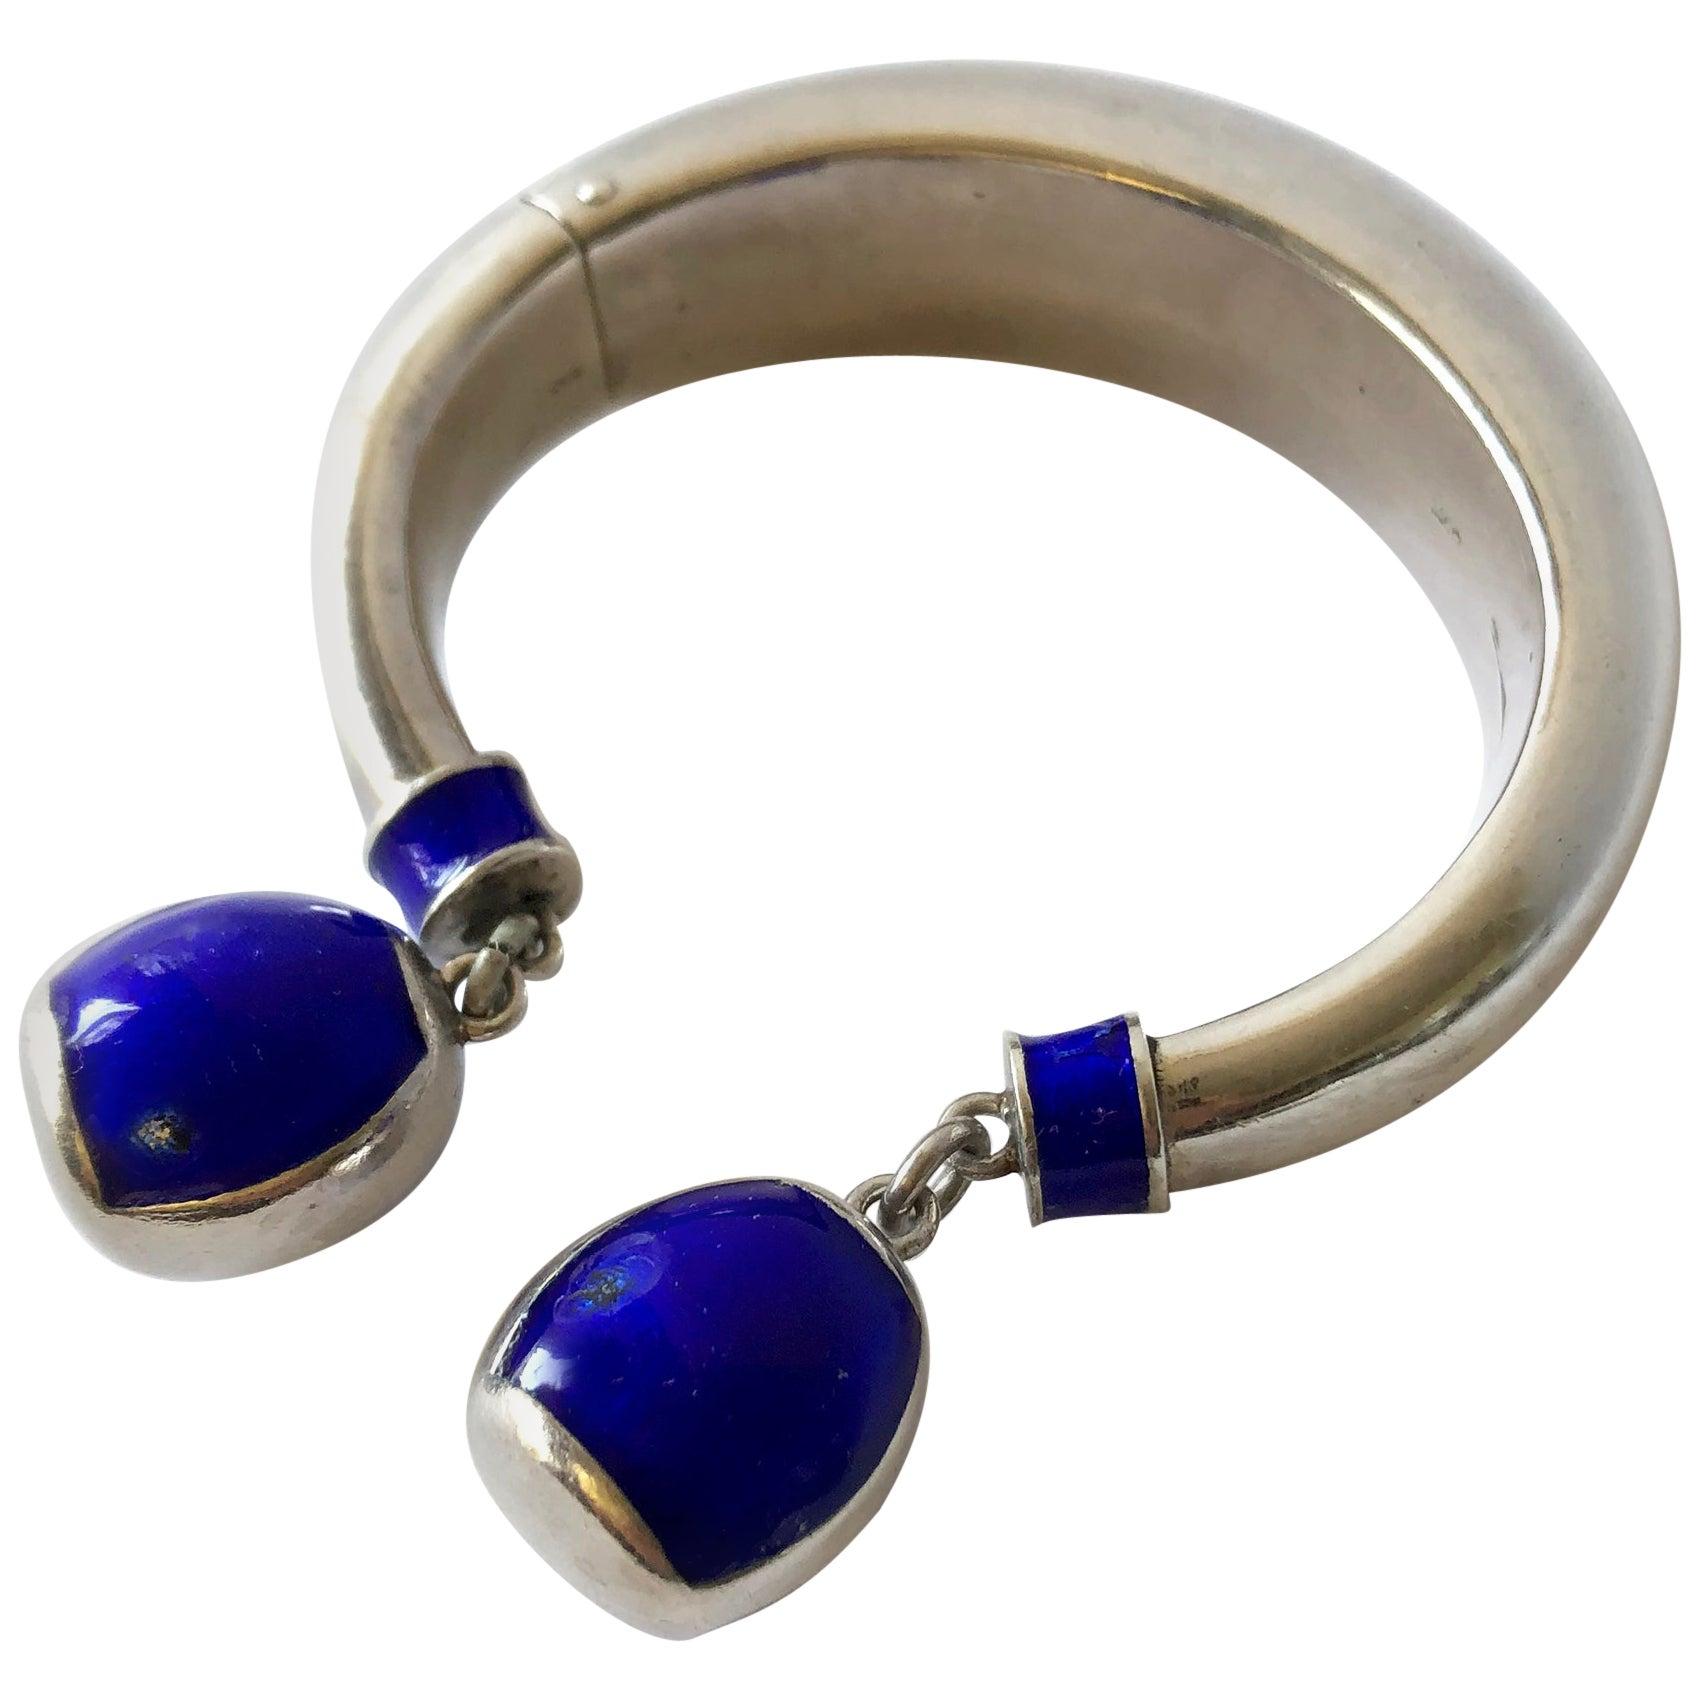 Vintage 1960s Gucci Italy Sterling Silver Enamel Hinged Dangle Bracelet